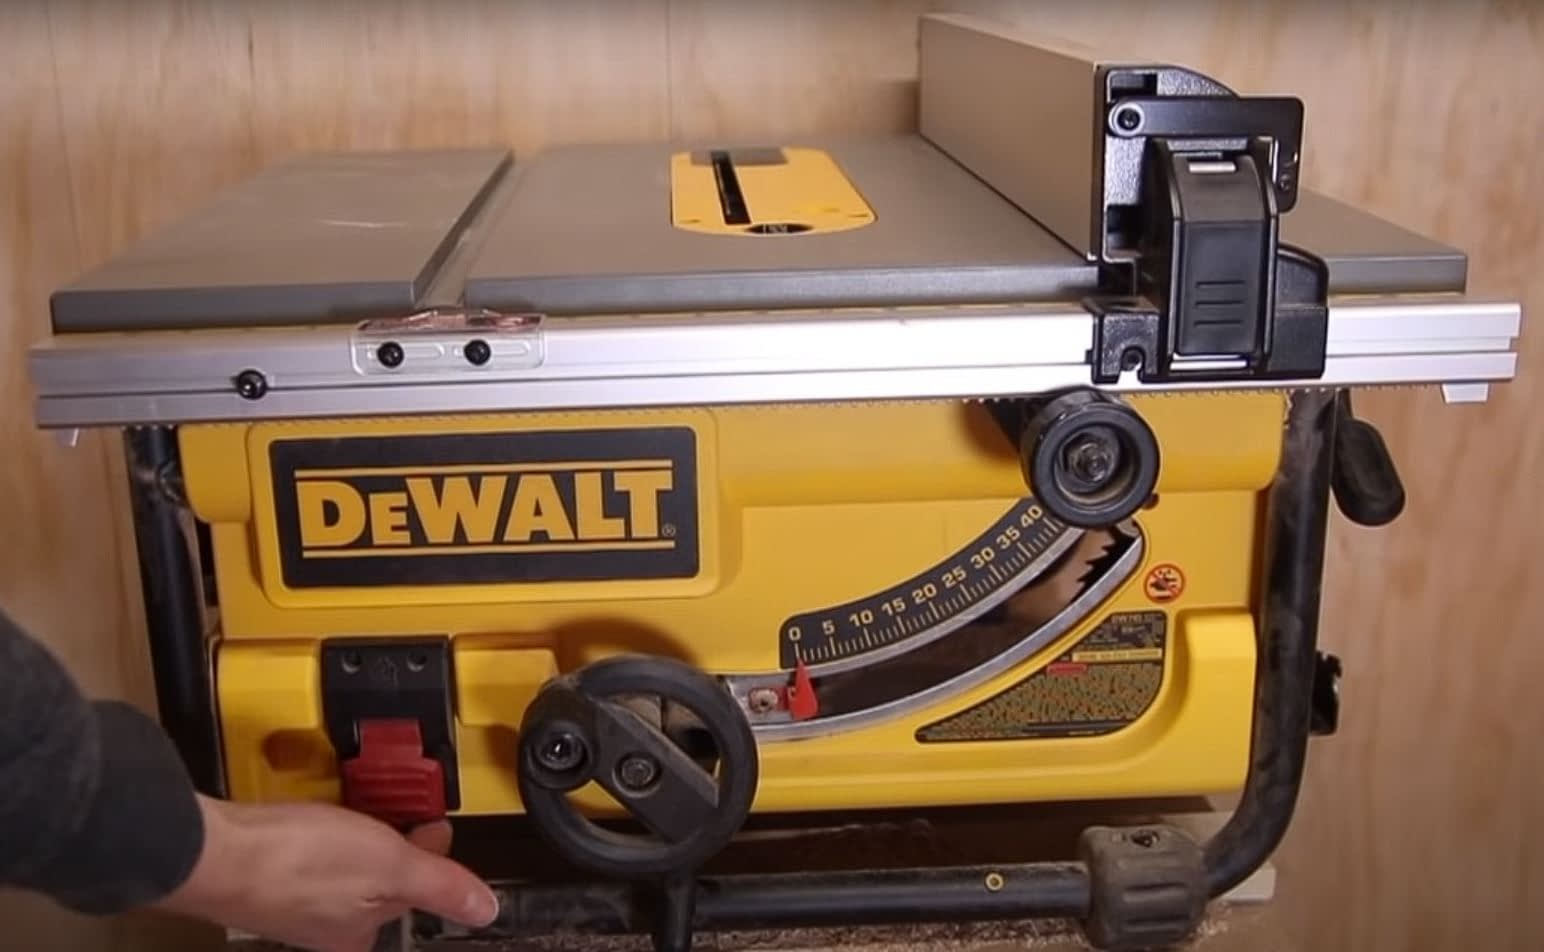 DEWALT DW745 10-INCH Table Saw Review